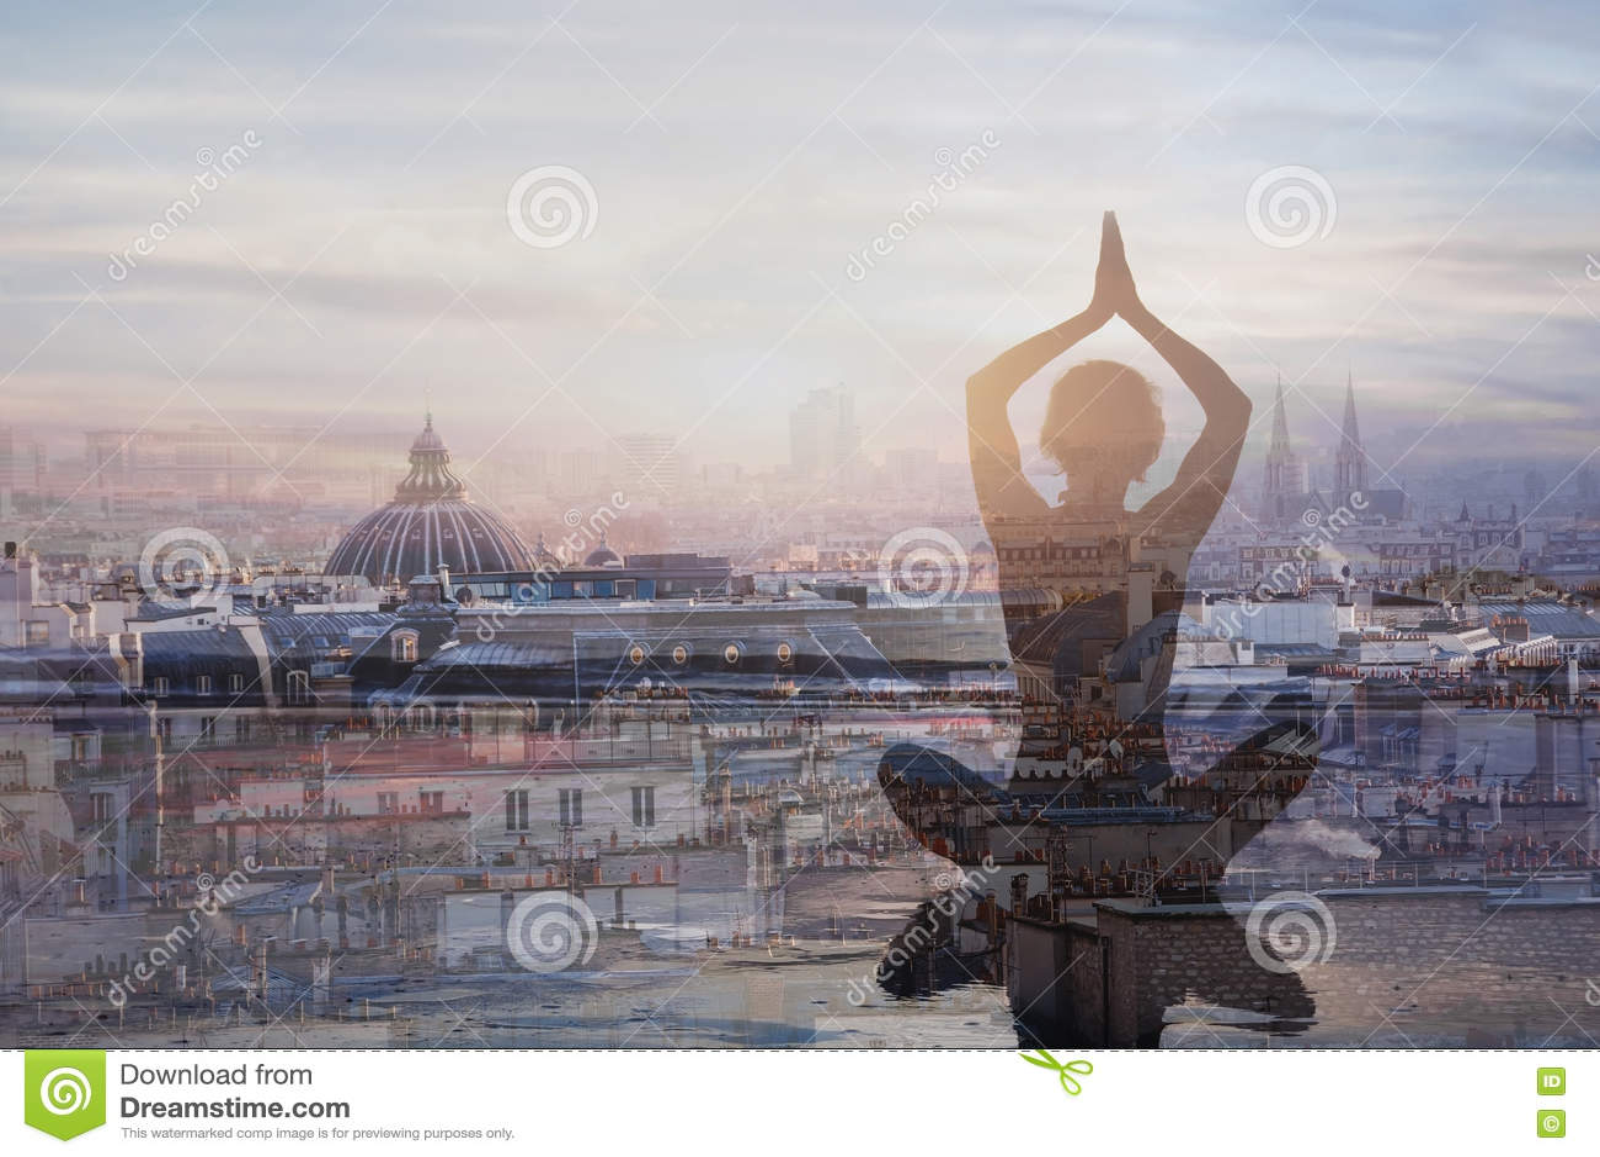 Yoga en meditatie in grote stad, dubbele blootstelling